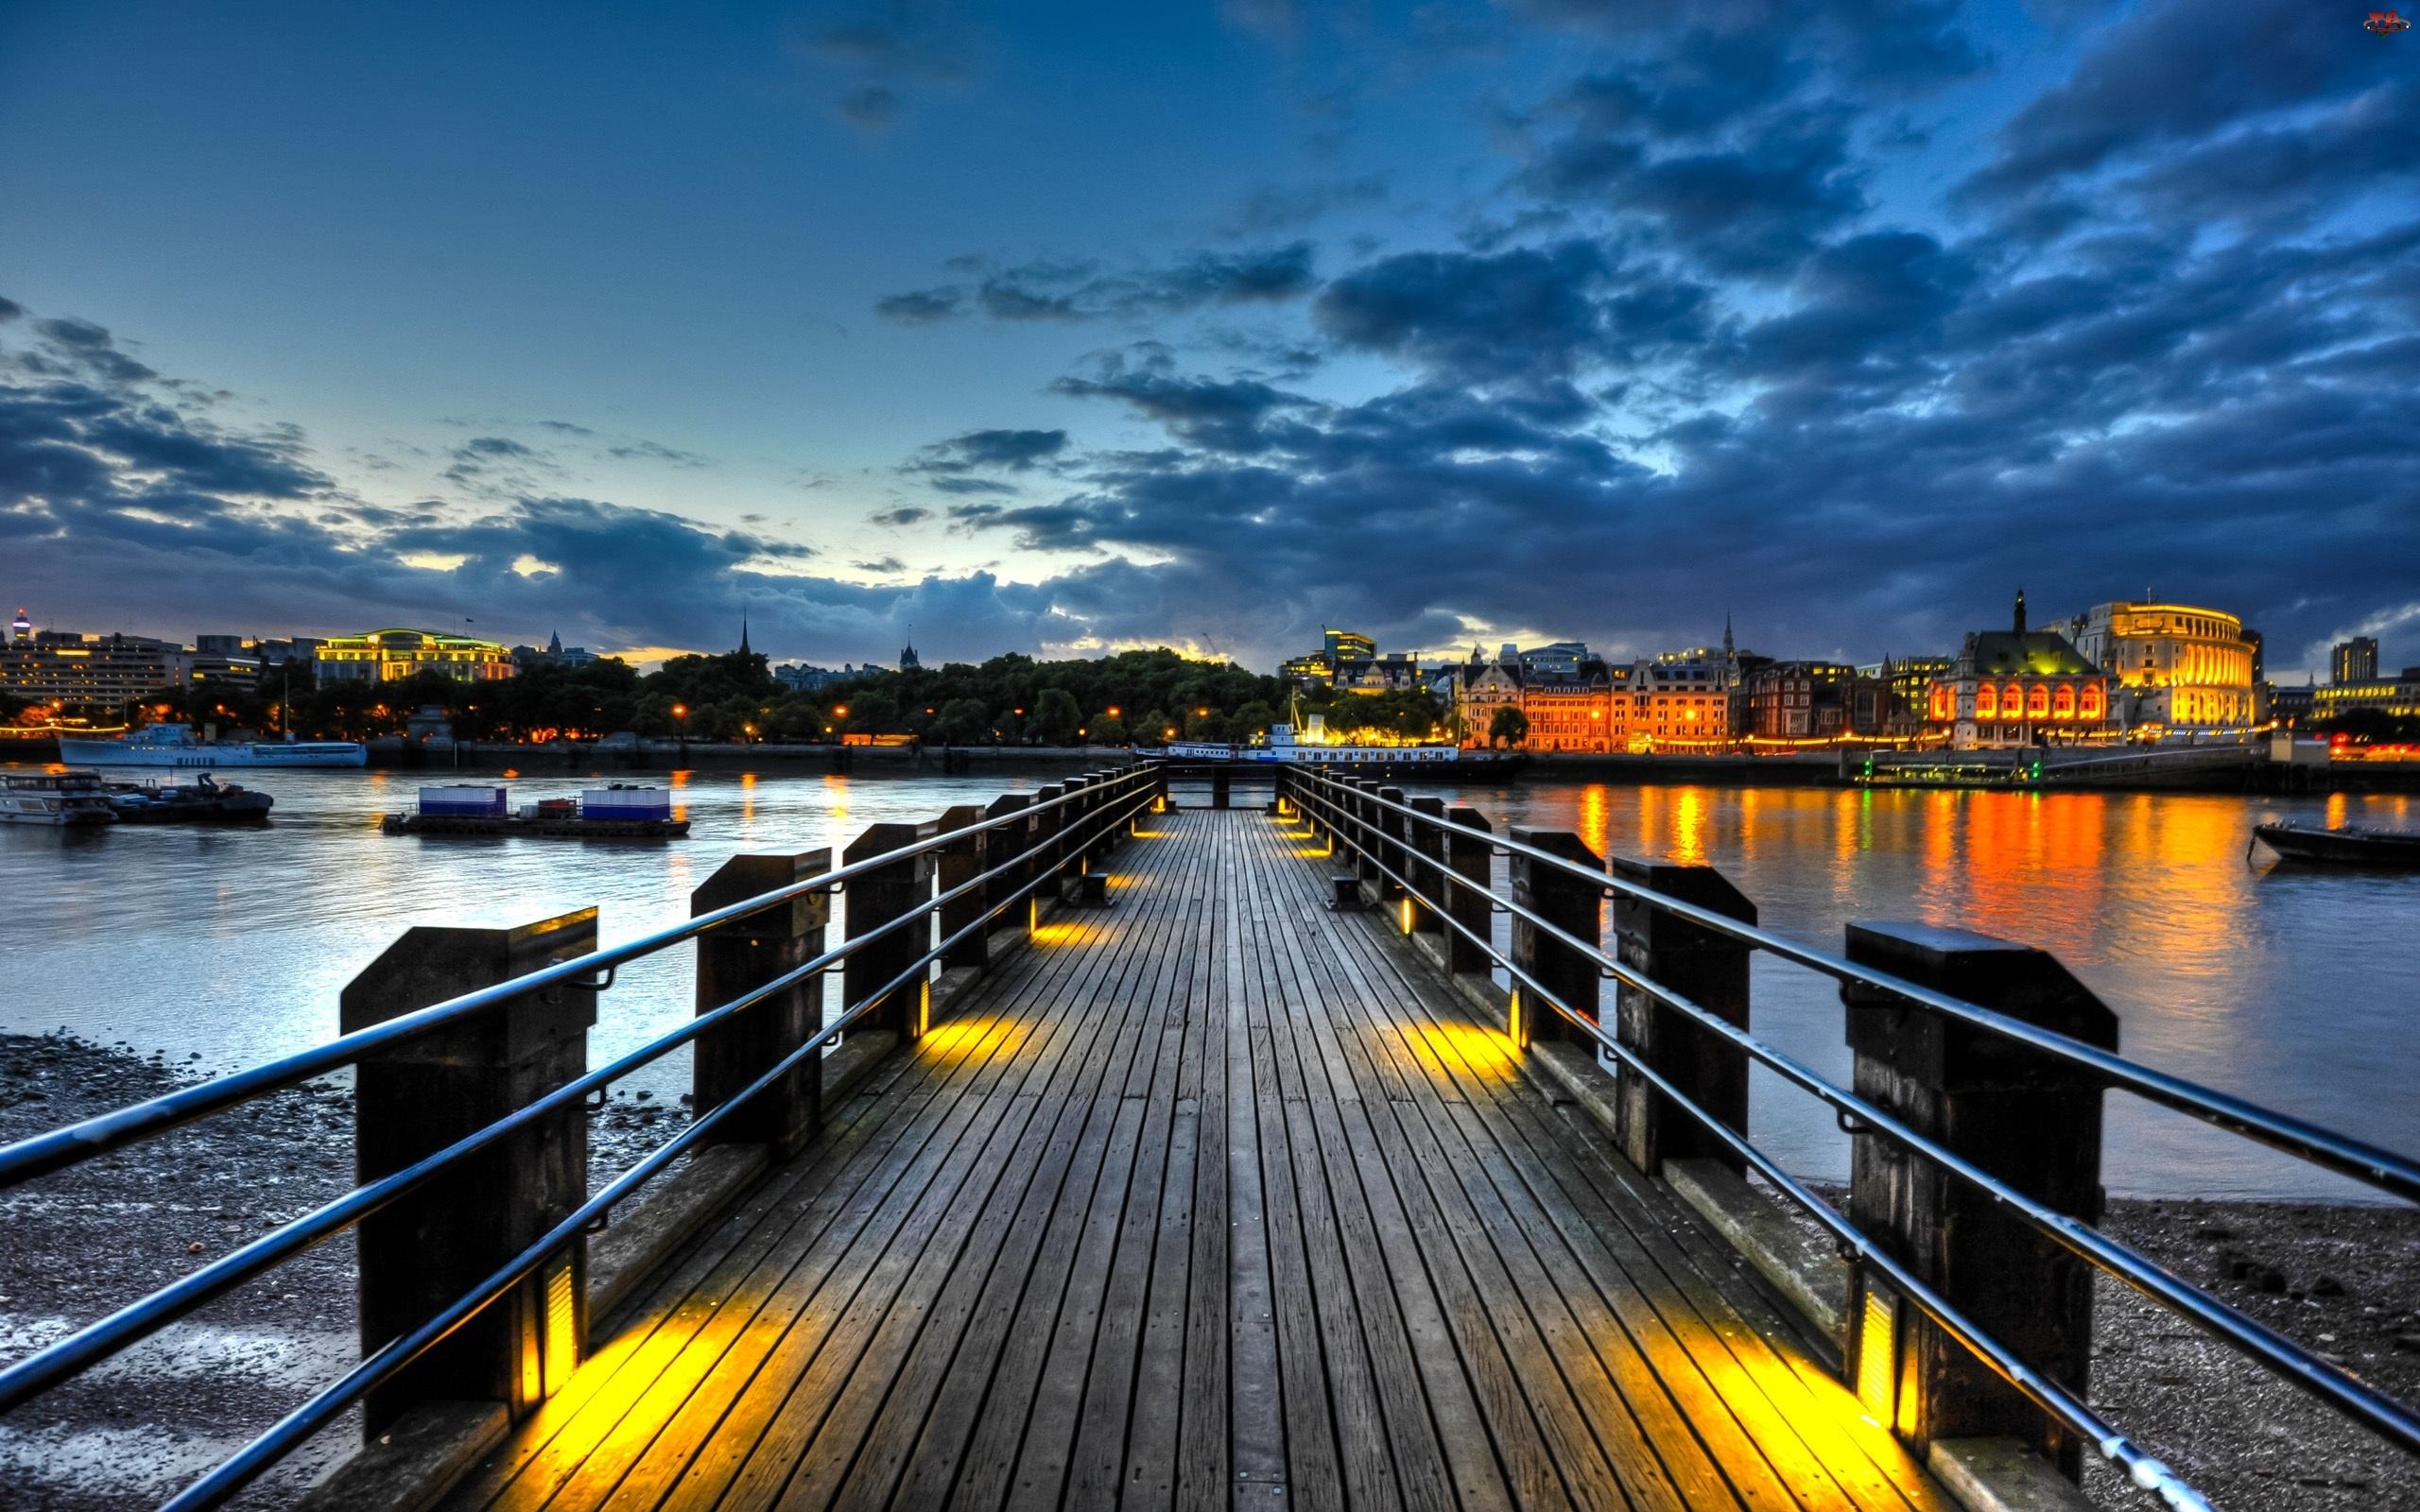 Miasto, Molo, Rzeka